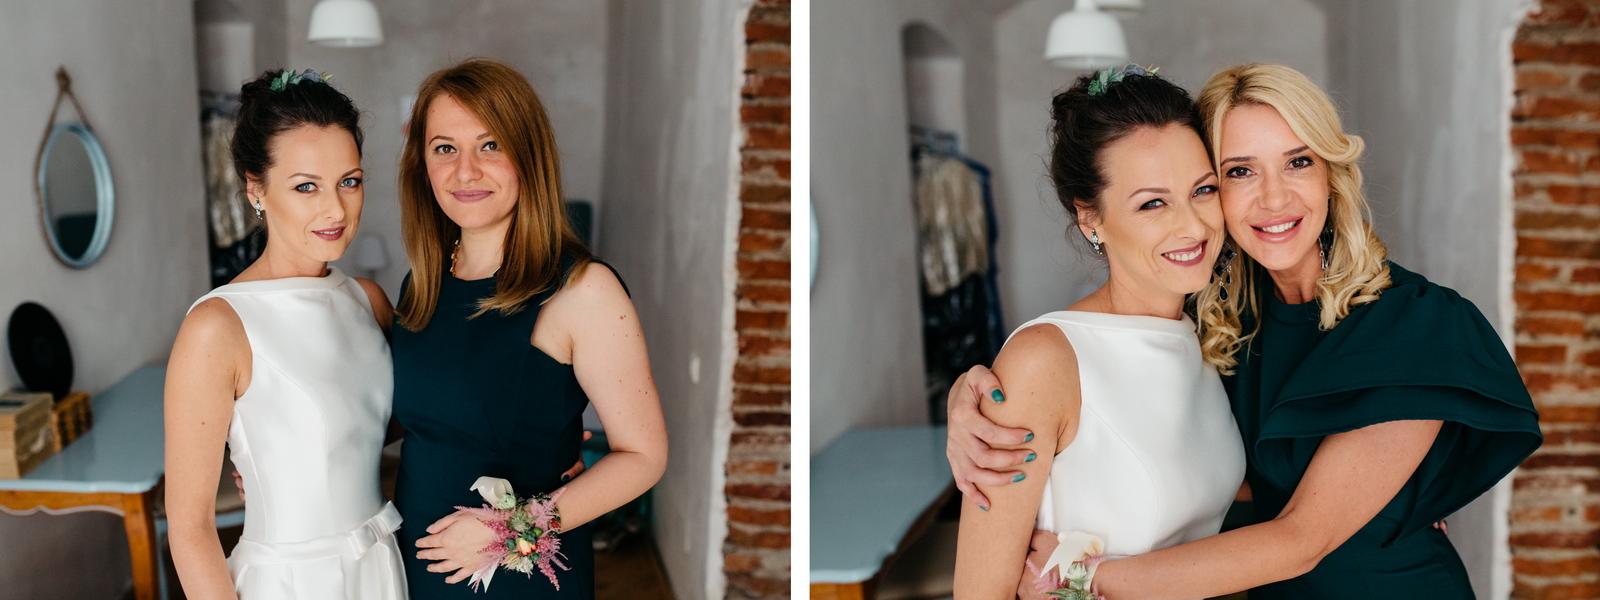 rely_flavius_wedding_cluj_napoca_simion_sebastian_photographer-038 (4)